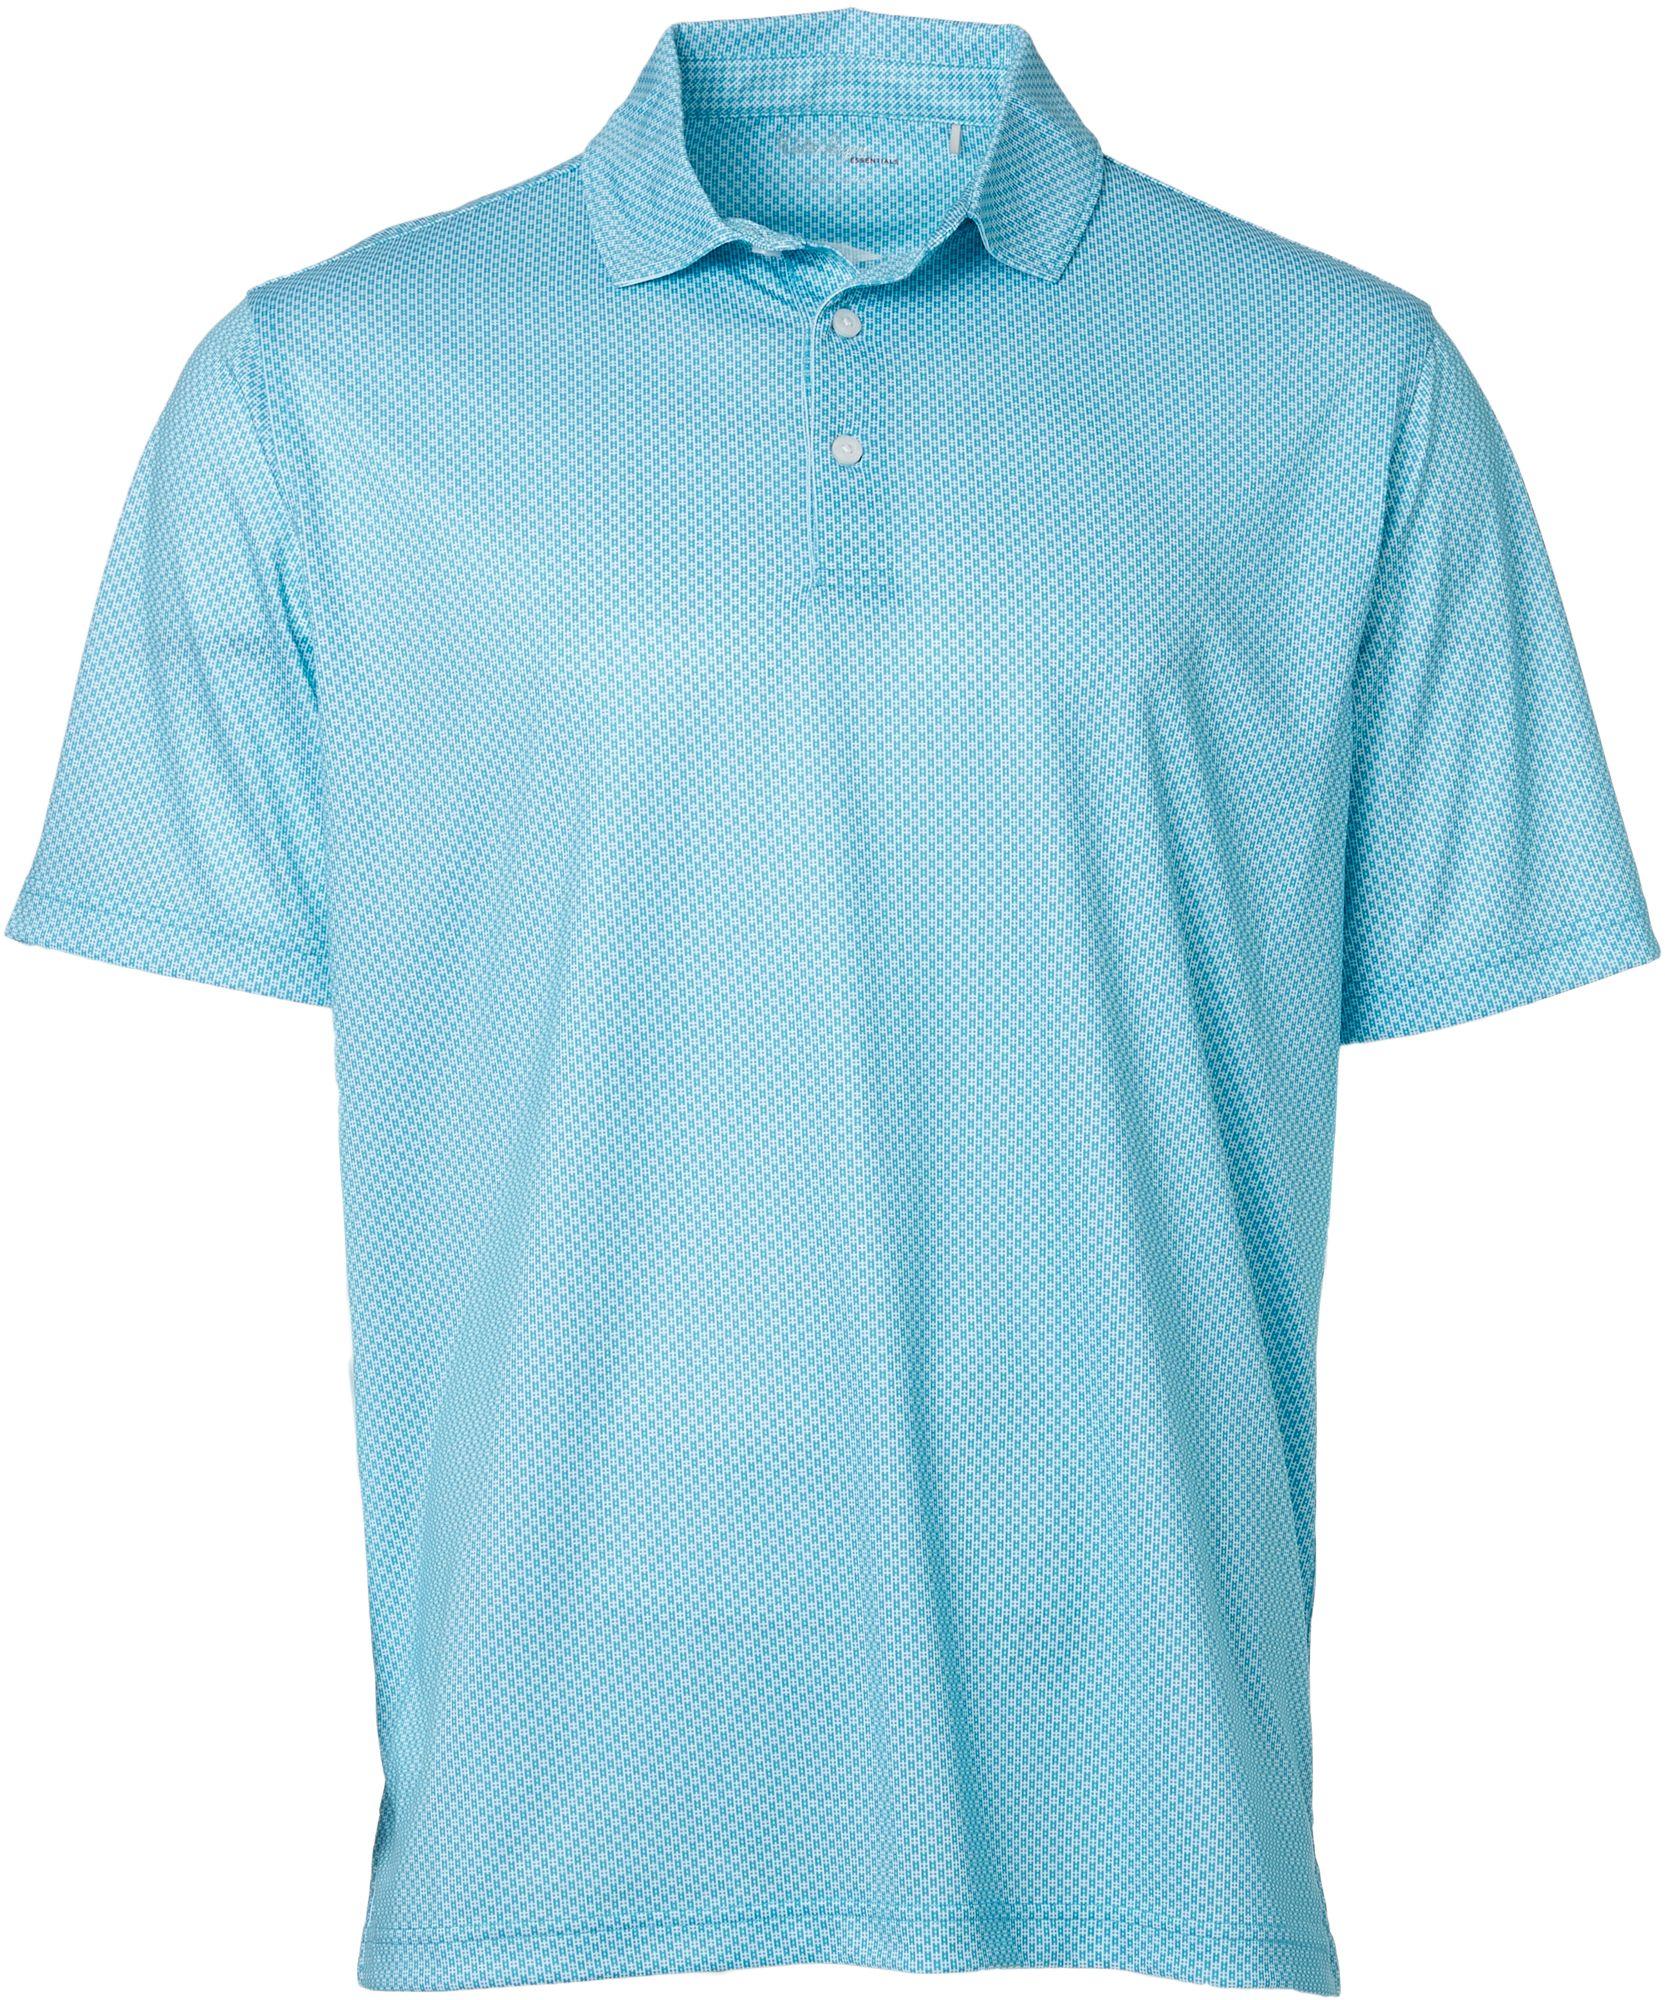 Golf Polo Shirts Printed Rldm